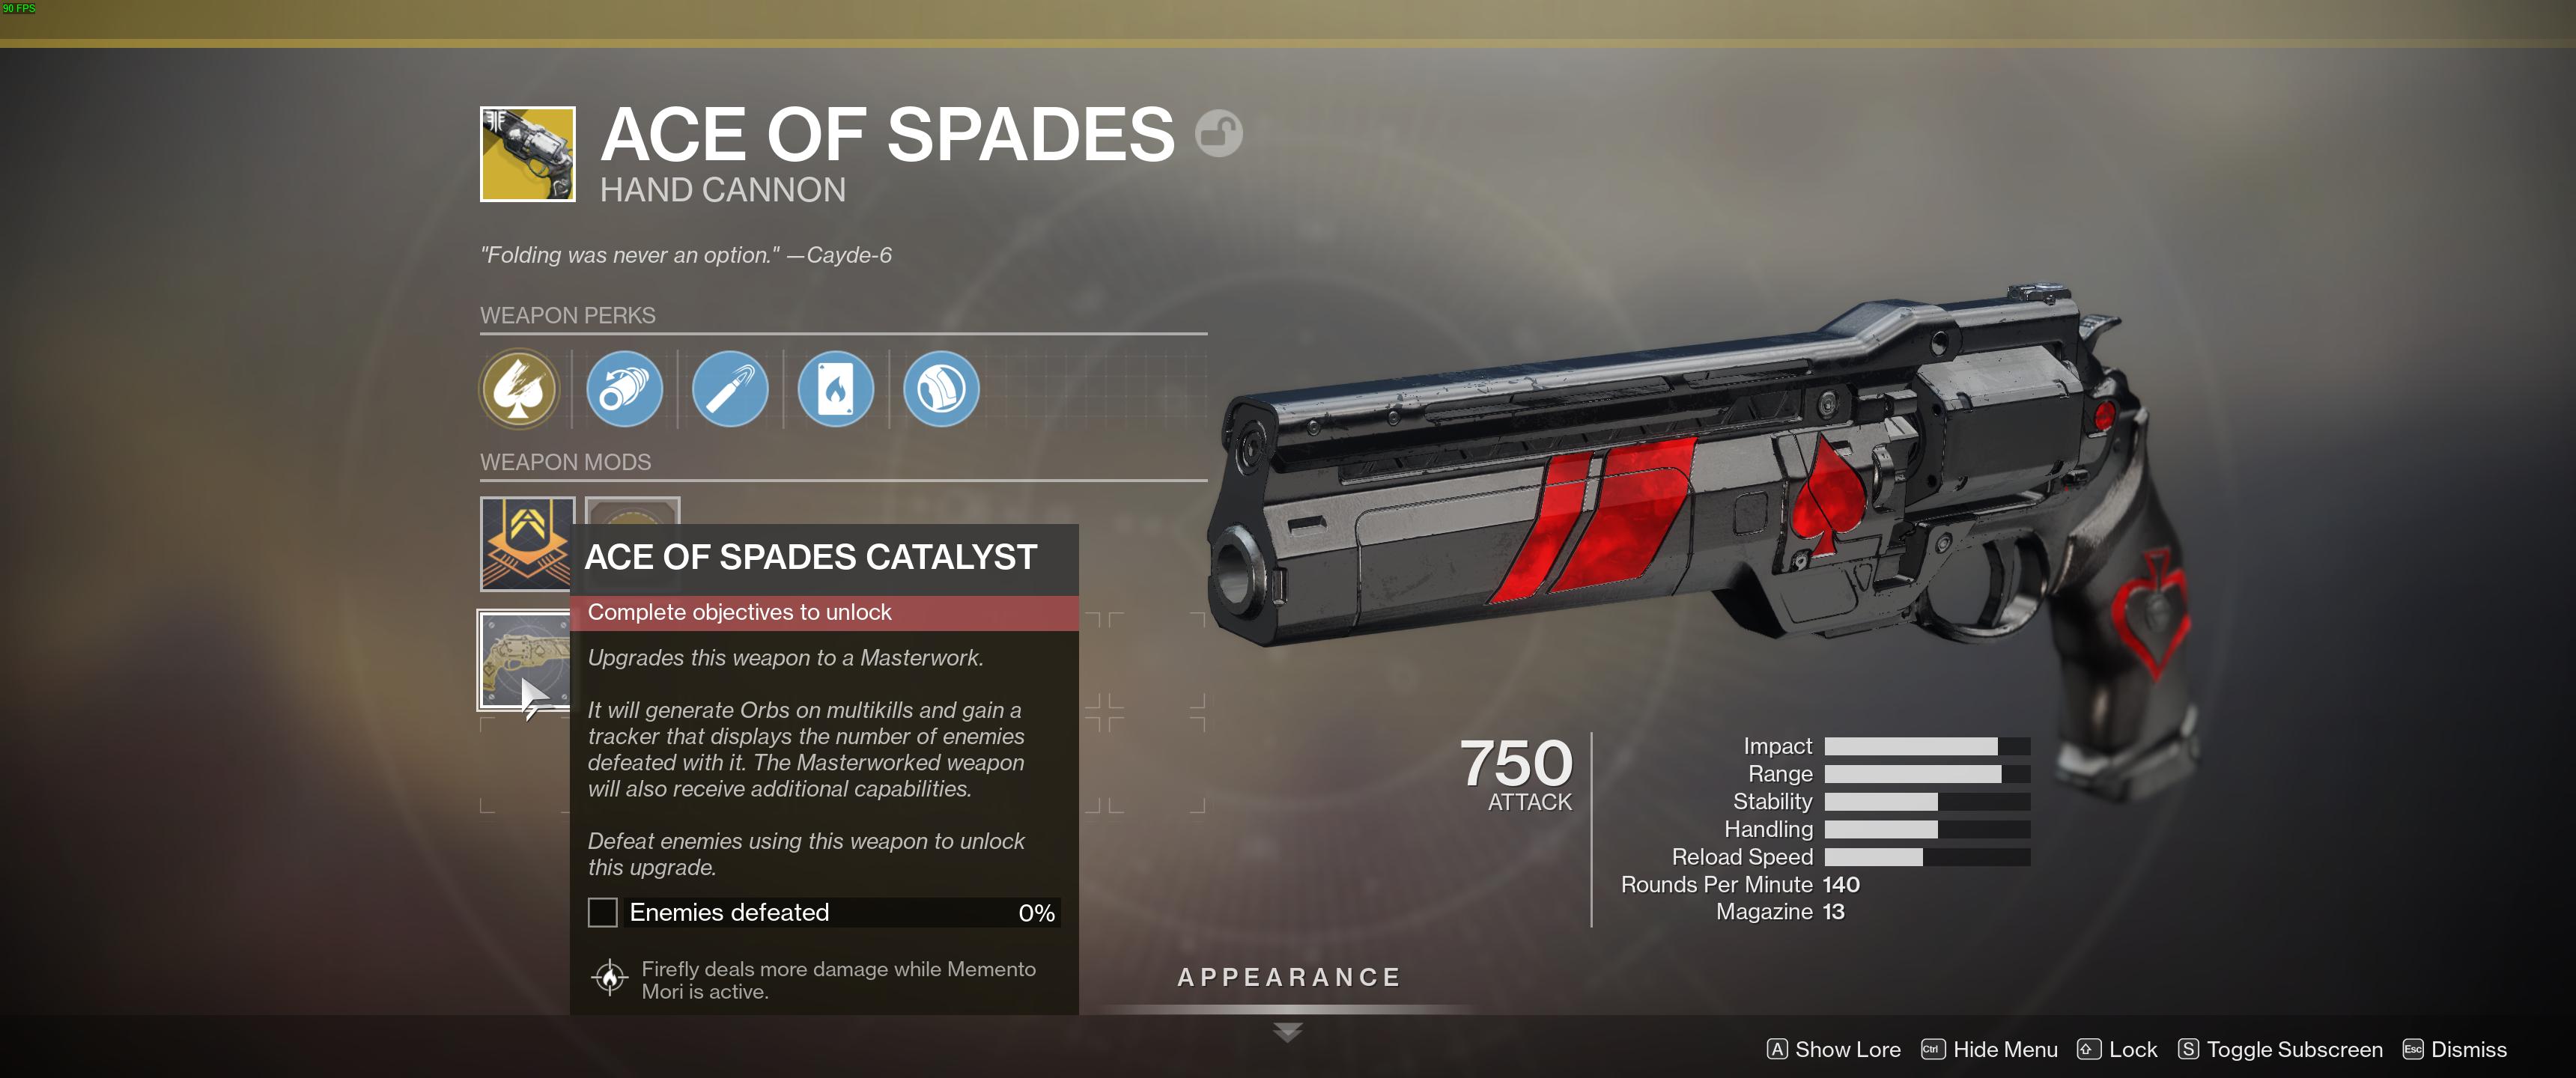 Destiny 2 The Ace of Spades Catalyst